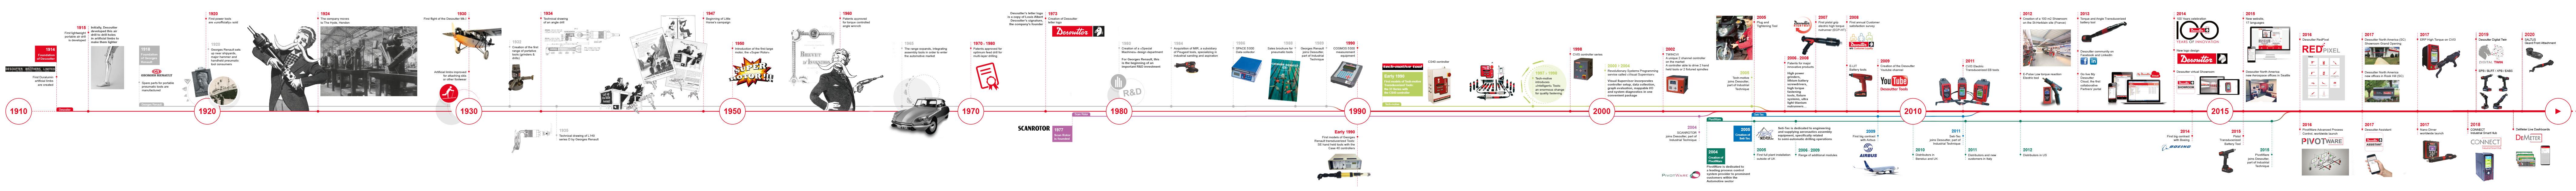 History of an innovative brand